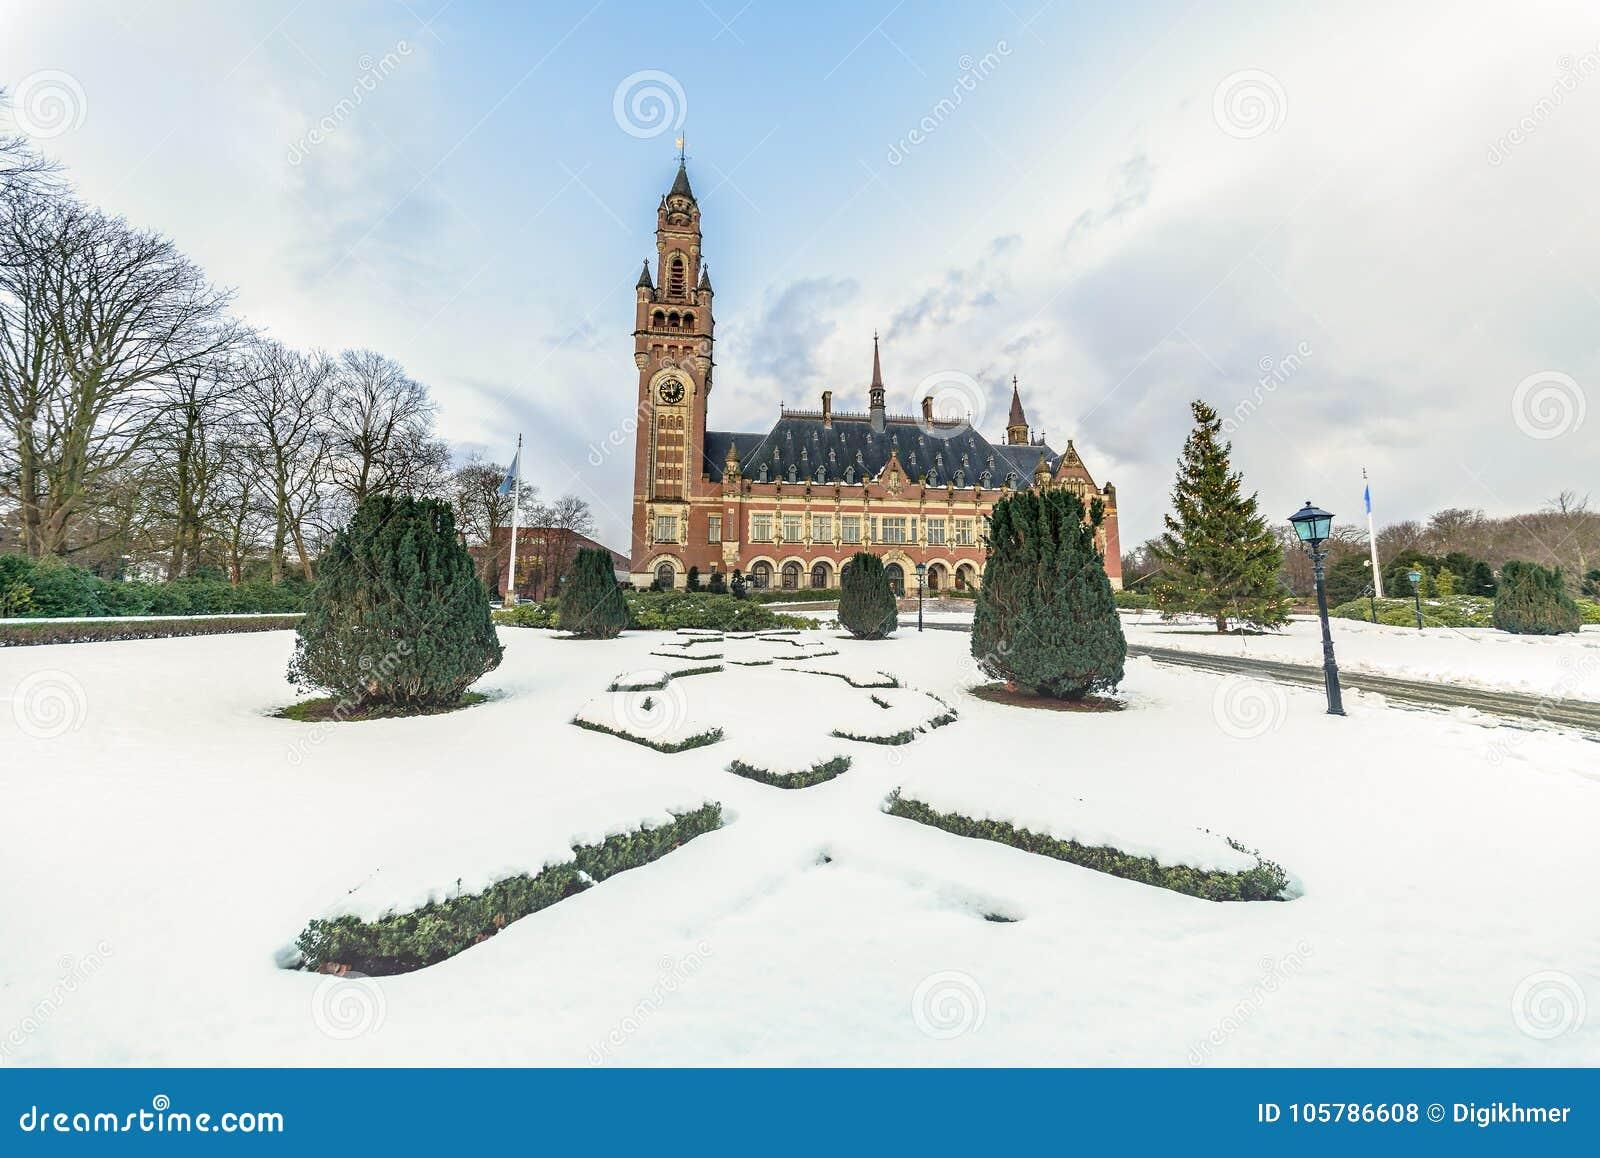 Palazzo di pace, Vredespaleis, sotto la neve